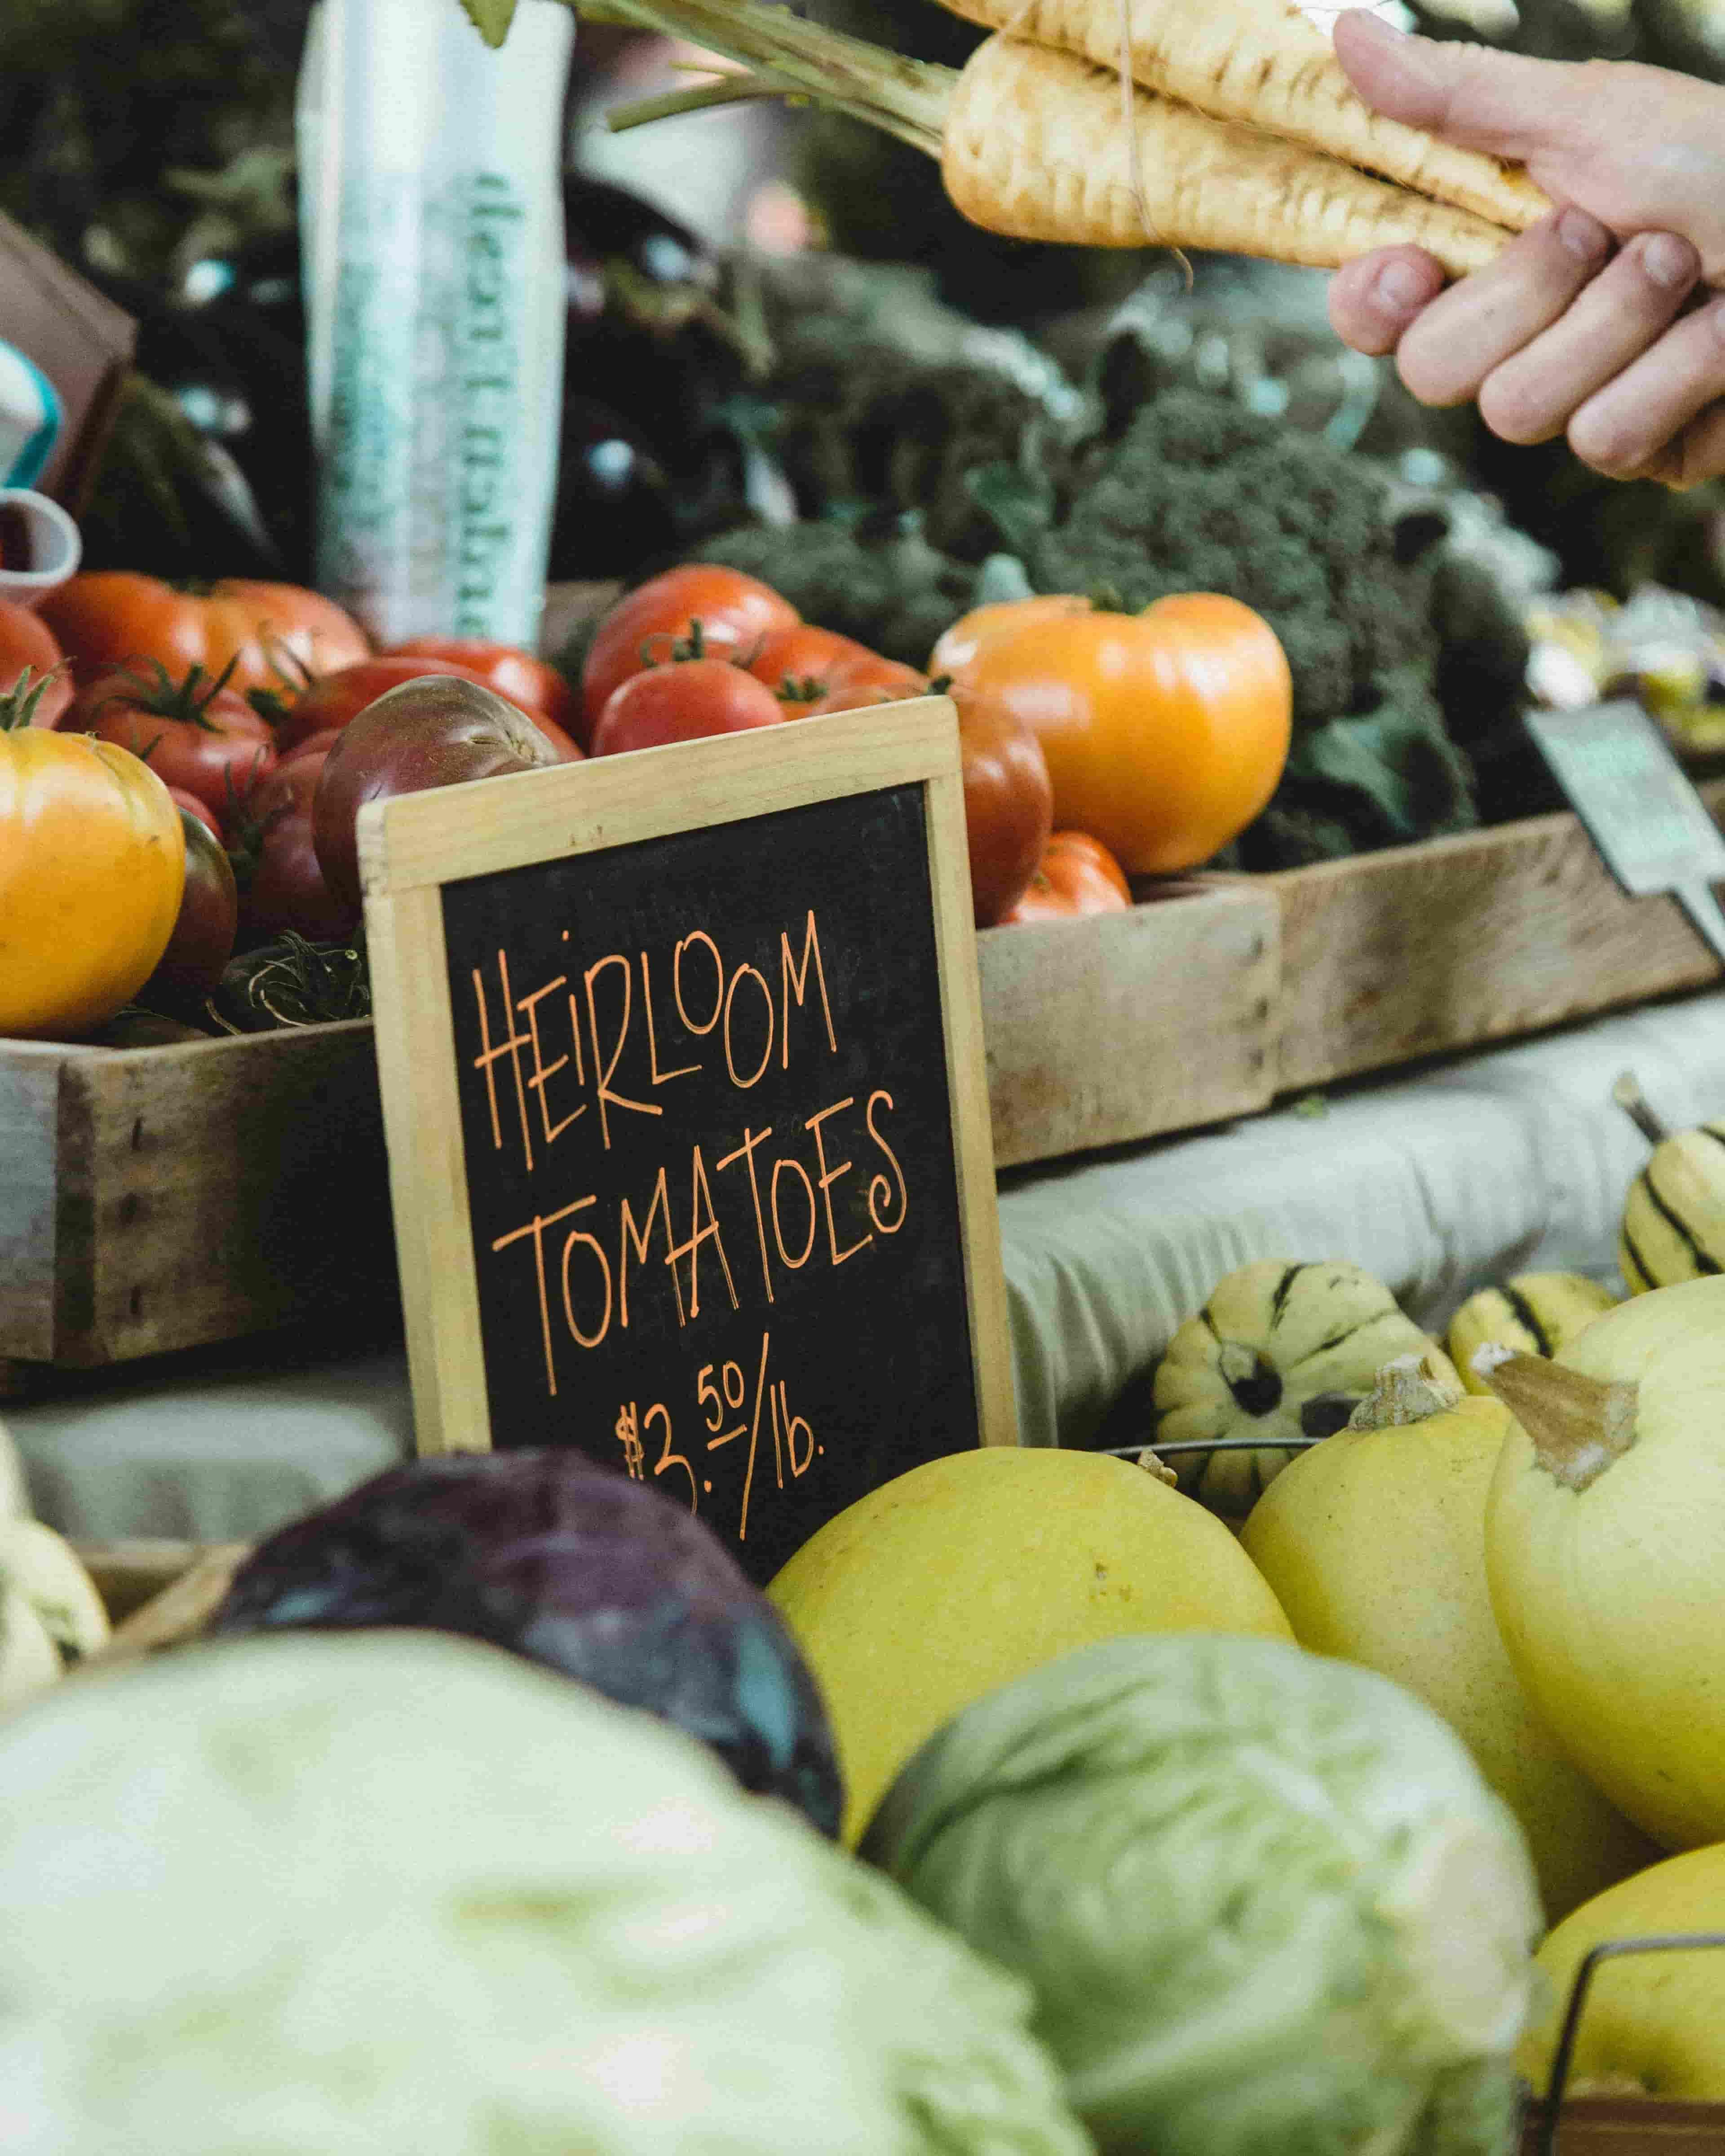 Shop & Cook: Tompkins Square Farmer's Market